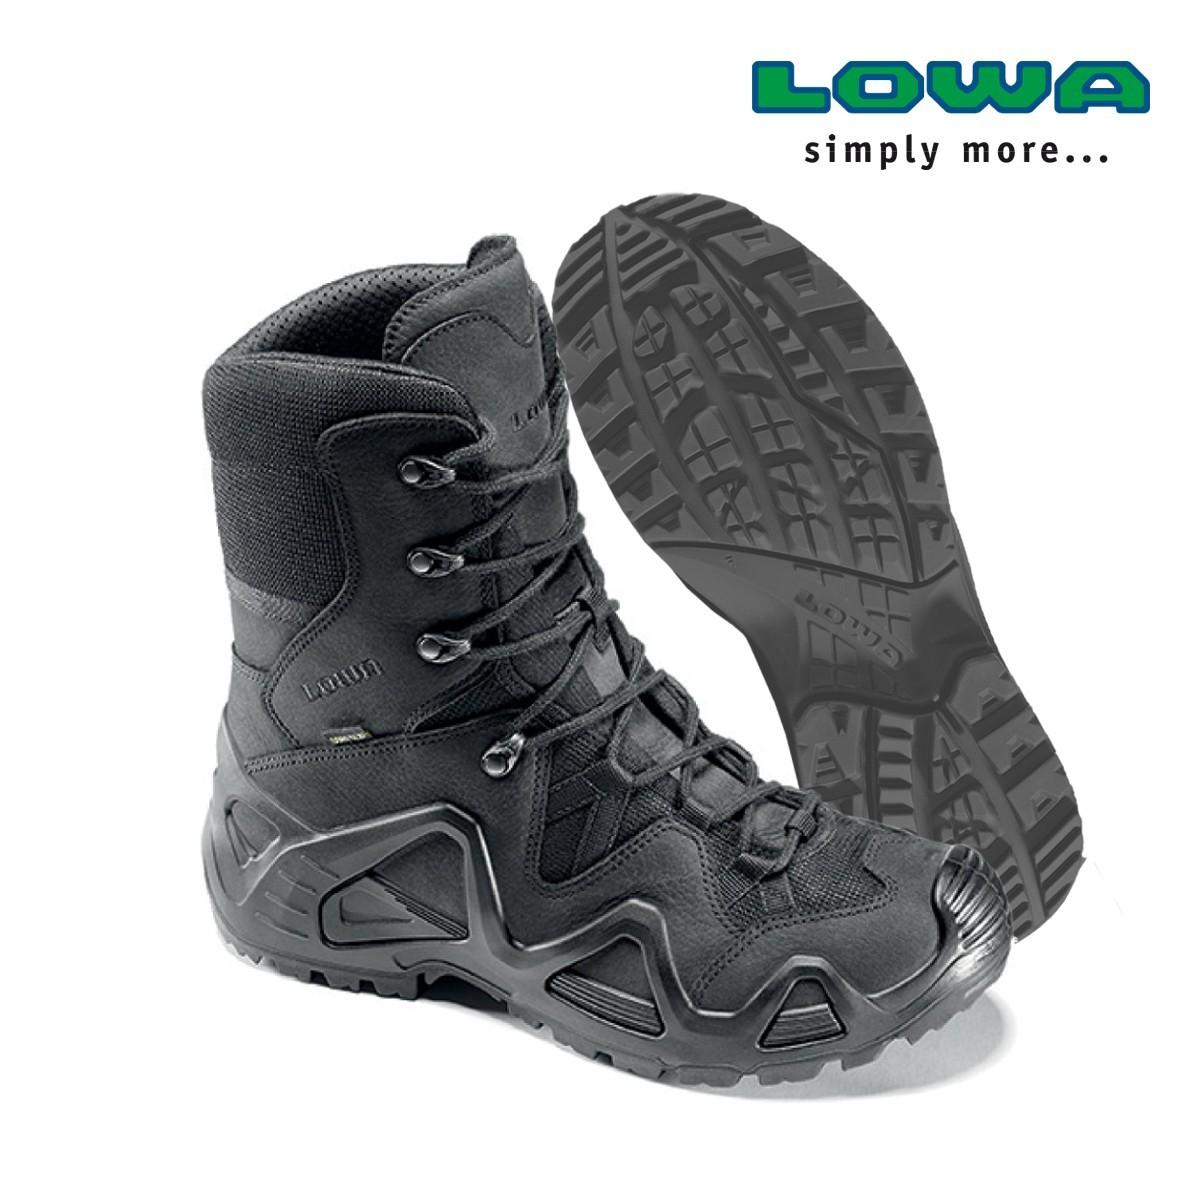 chaussure intervention oakley pas cher